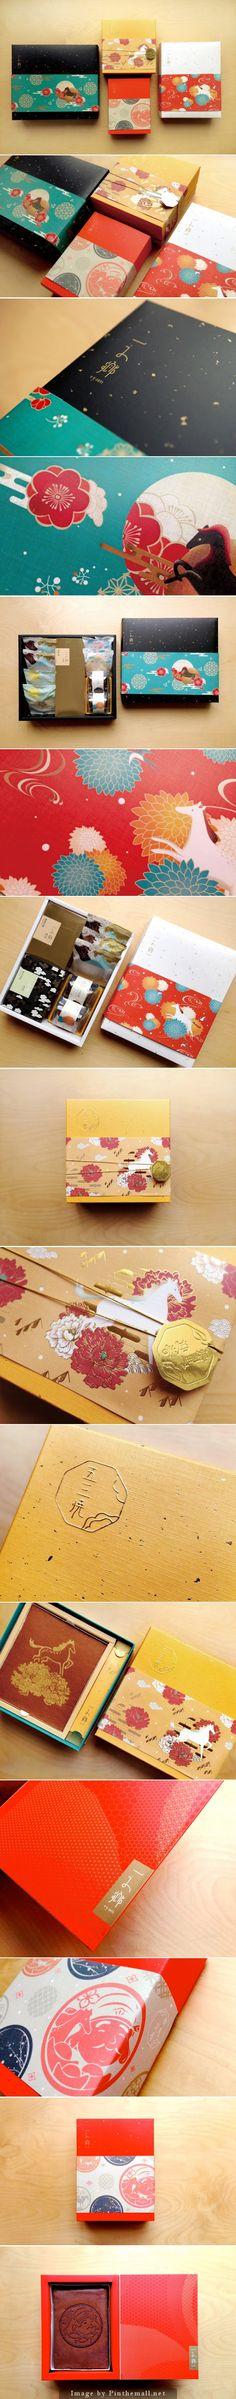 Agency: MURA Creative Director: Tom Chen Copywriter: Johnny Chang, Misha Chiang Designer(s): Ssu Ying Pan , Oli Syu Photographer: Ssu Ying Pan Client: E-g-sain Co.,Ltd. Type Of Work: Commercial Work Country: Taiwan - created via http://pinthemall.net